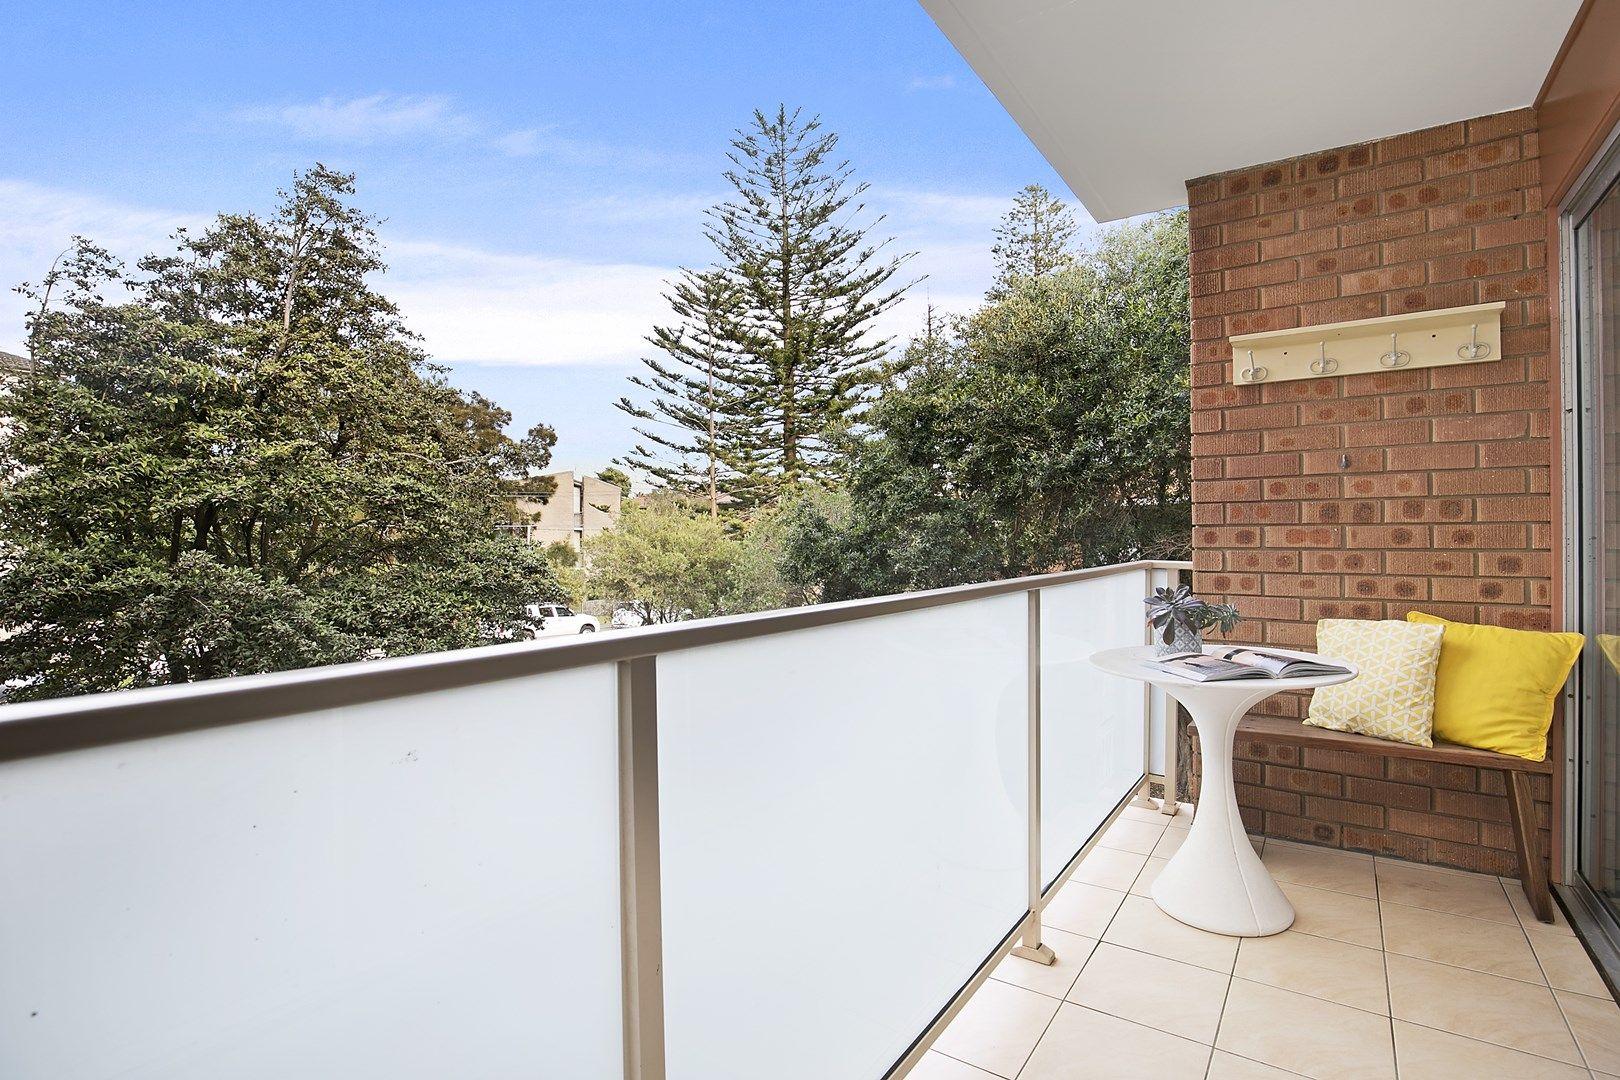 2/36 Seabeach  Avenue, Mona Vale NSW 2103, Image 0